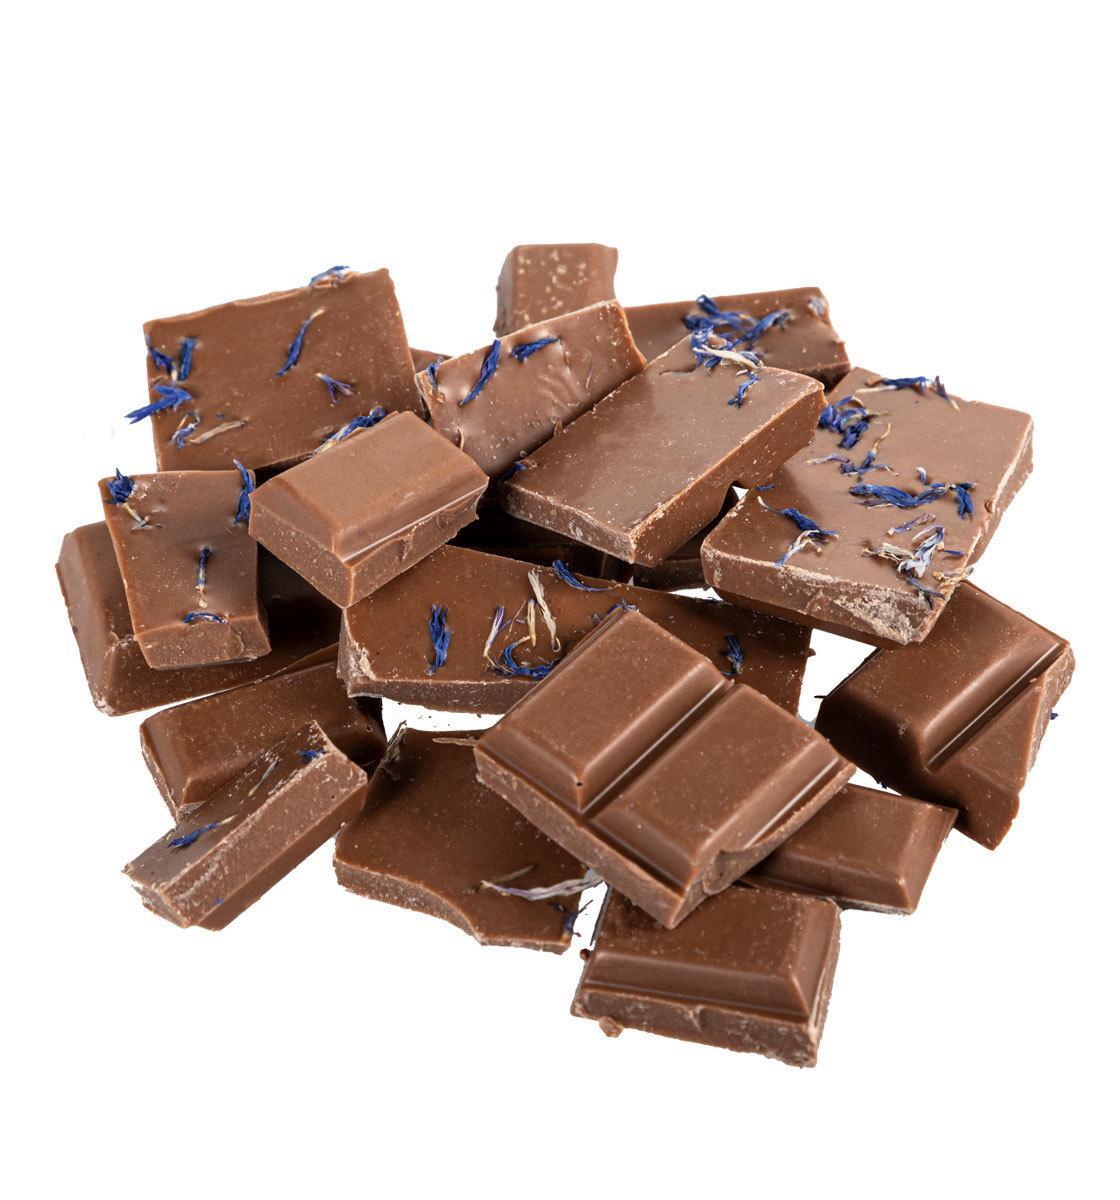 Schade Schokolade